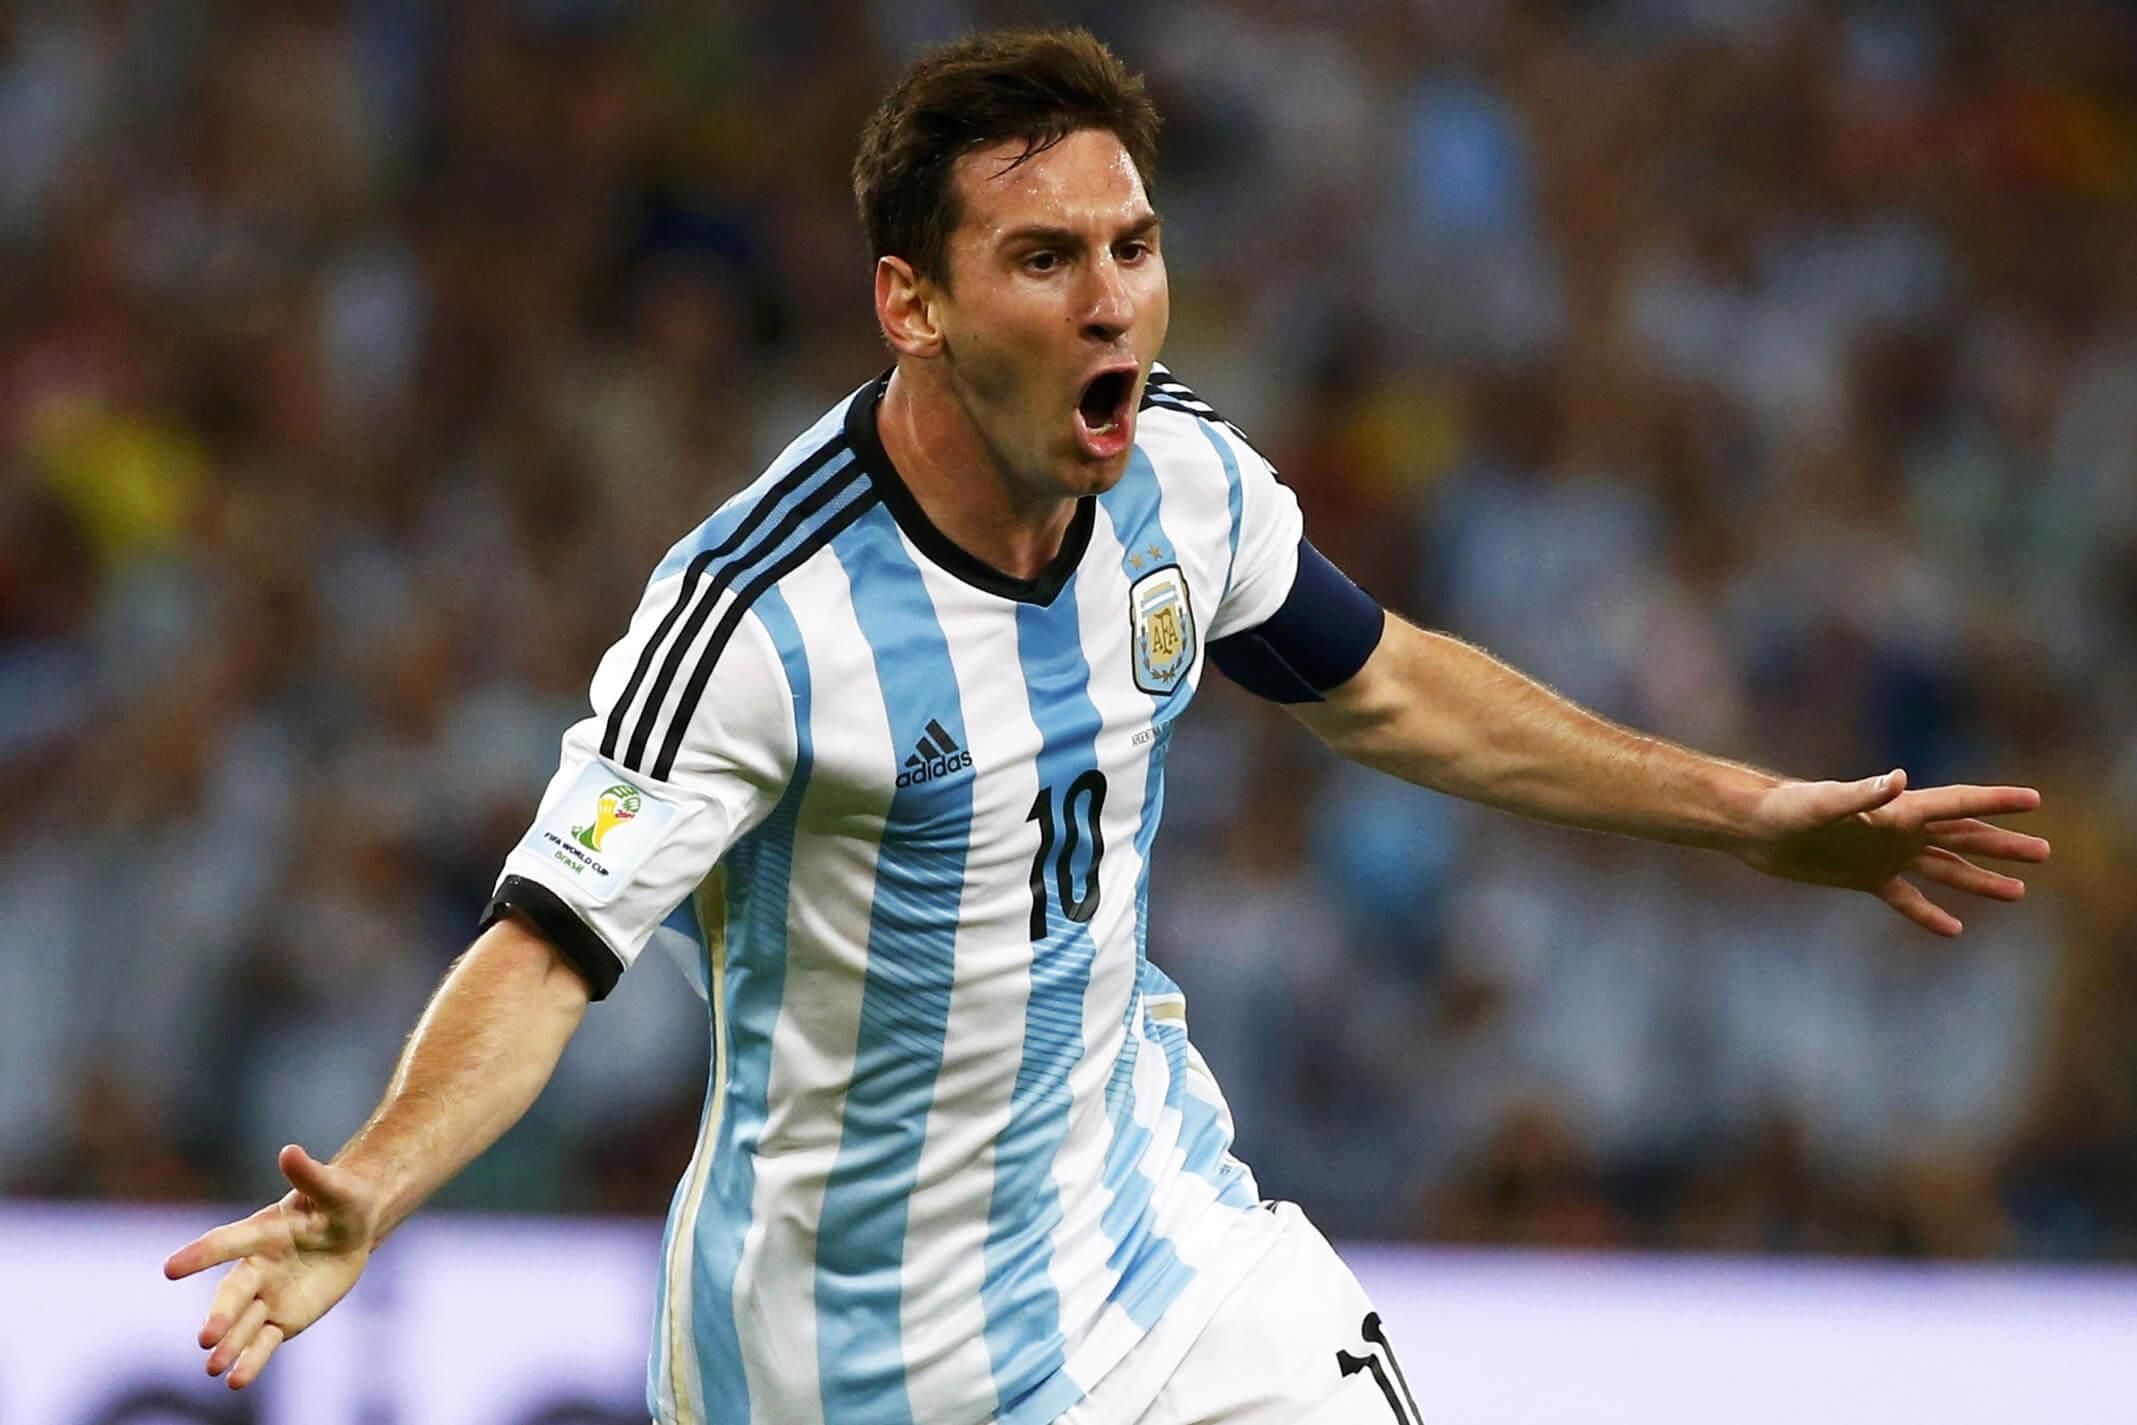 Messi Copa America Final 2015 Chile - Argentina